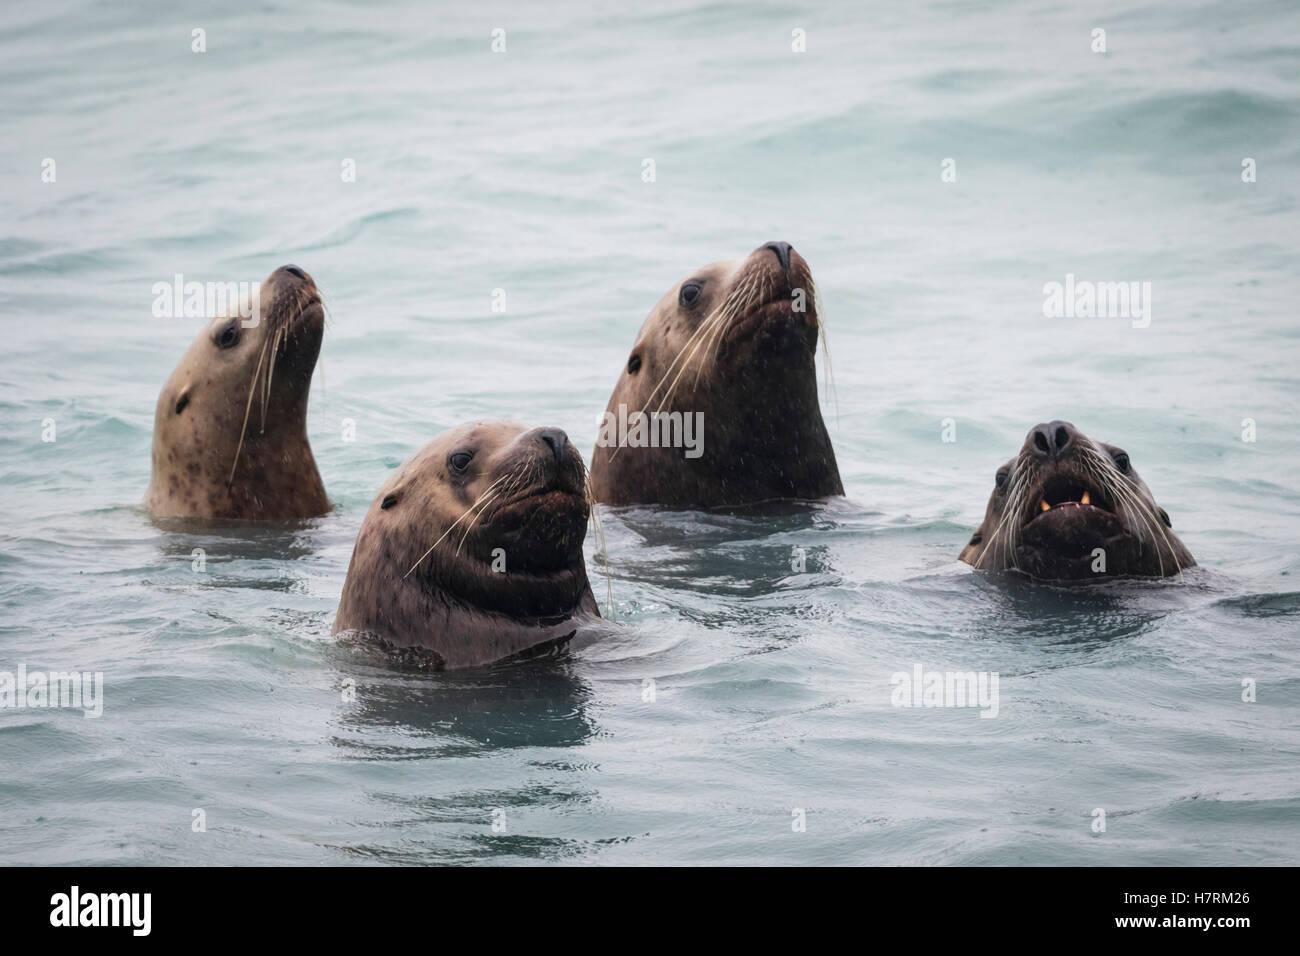 Stellar Sea lions (Eumetopias jubatus) swimming, South-central Alaska; Alaska, United States of America - Stock Image